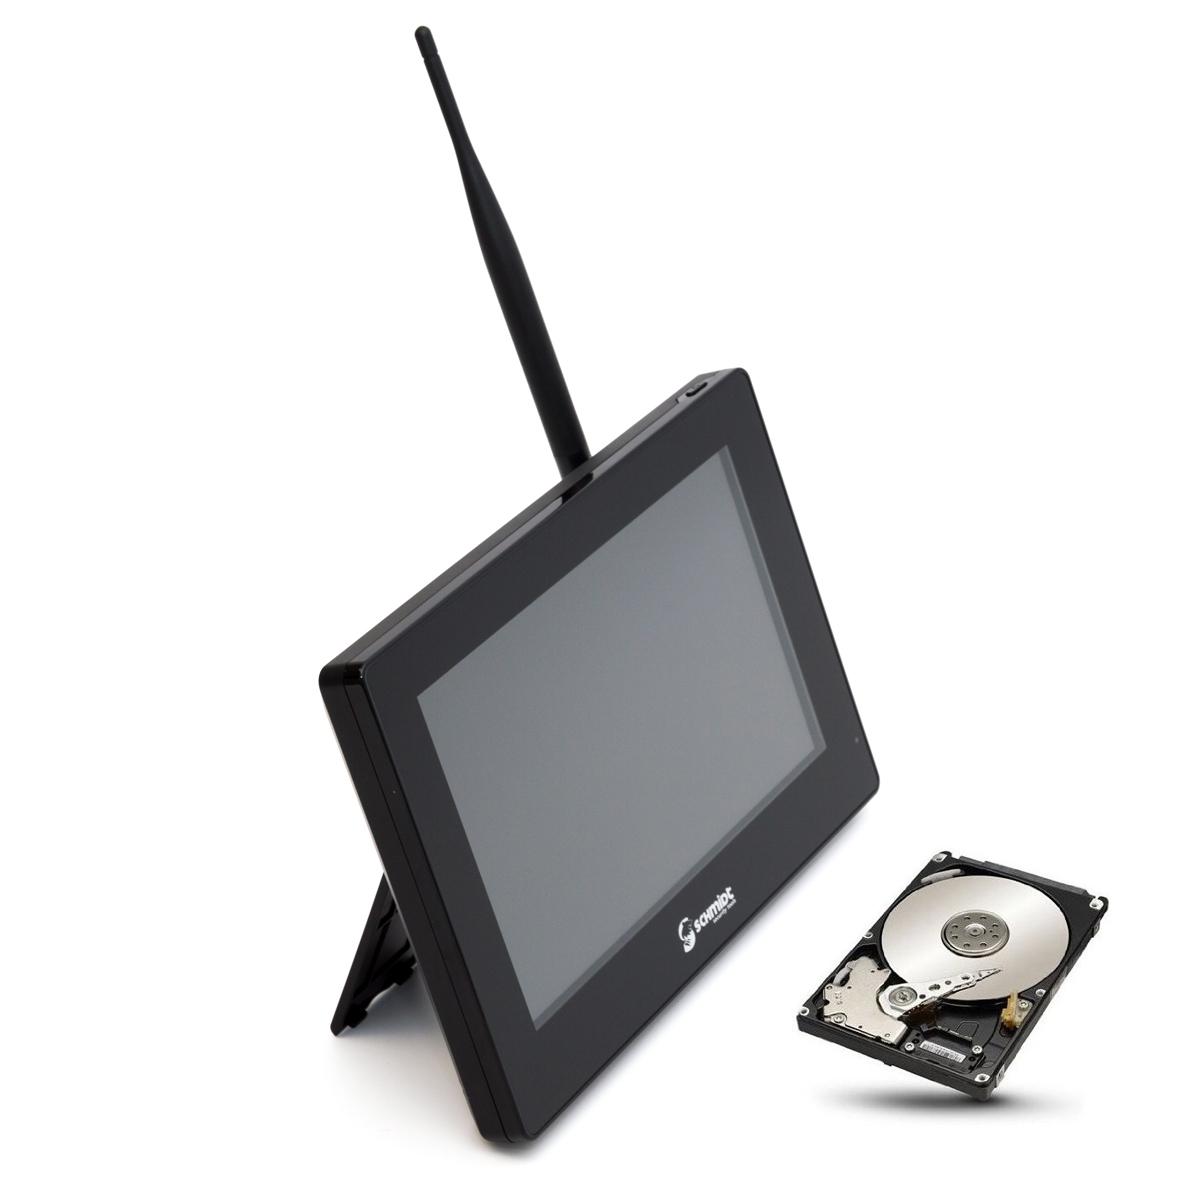 "SCHMIDT-Security-Tools Funk Überwachungssystem 3x Kamera 9"" Touch-Monitor mit Standfuß HD Videoüberwachungsanlage Drahtlos Überwachungsset Sicherheitssystem 500GB HDD Festplatte"